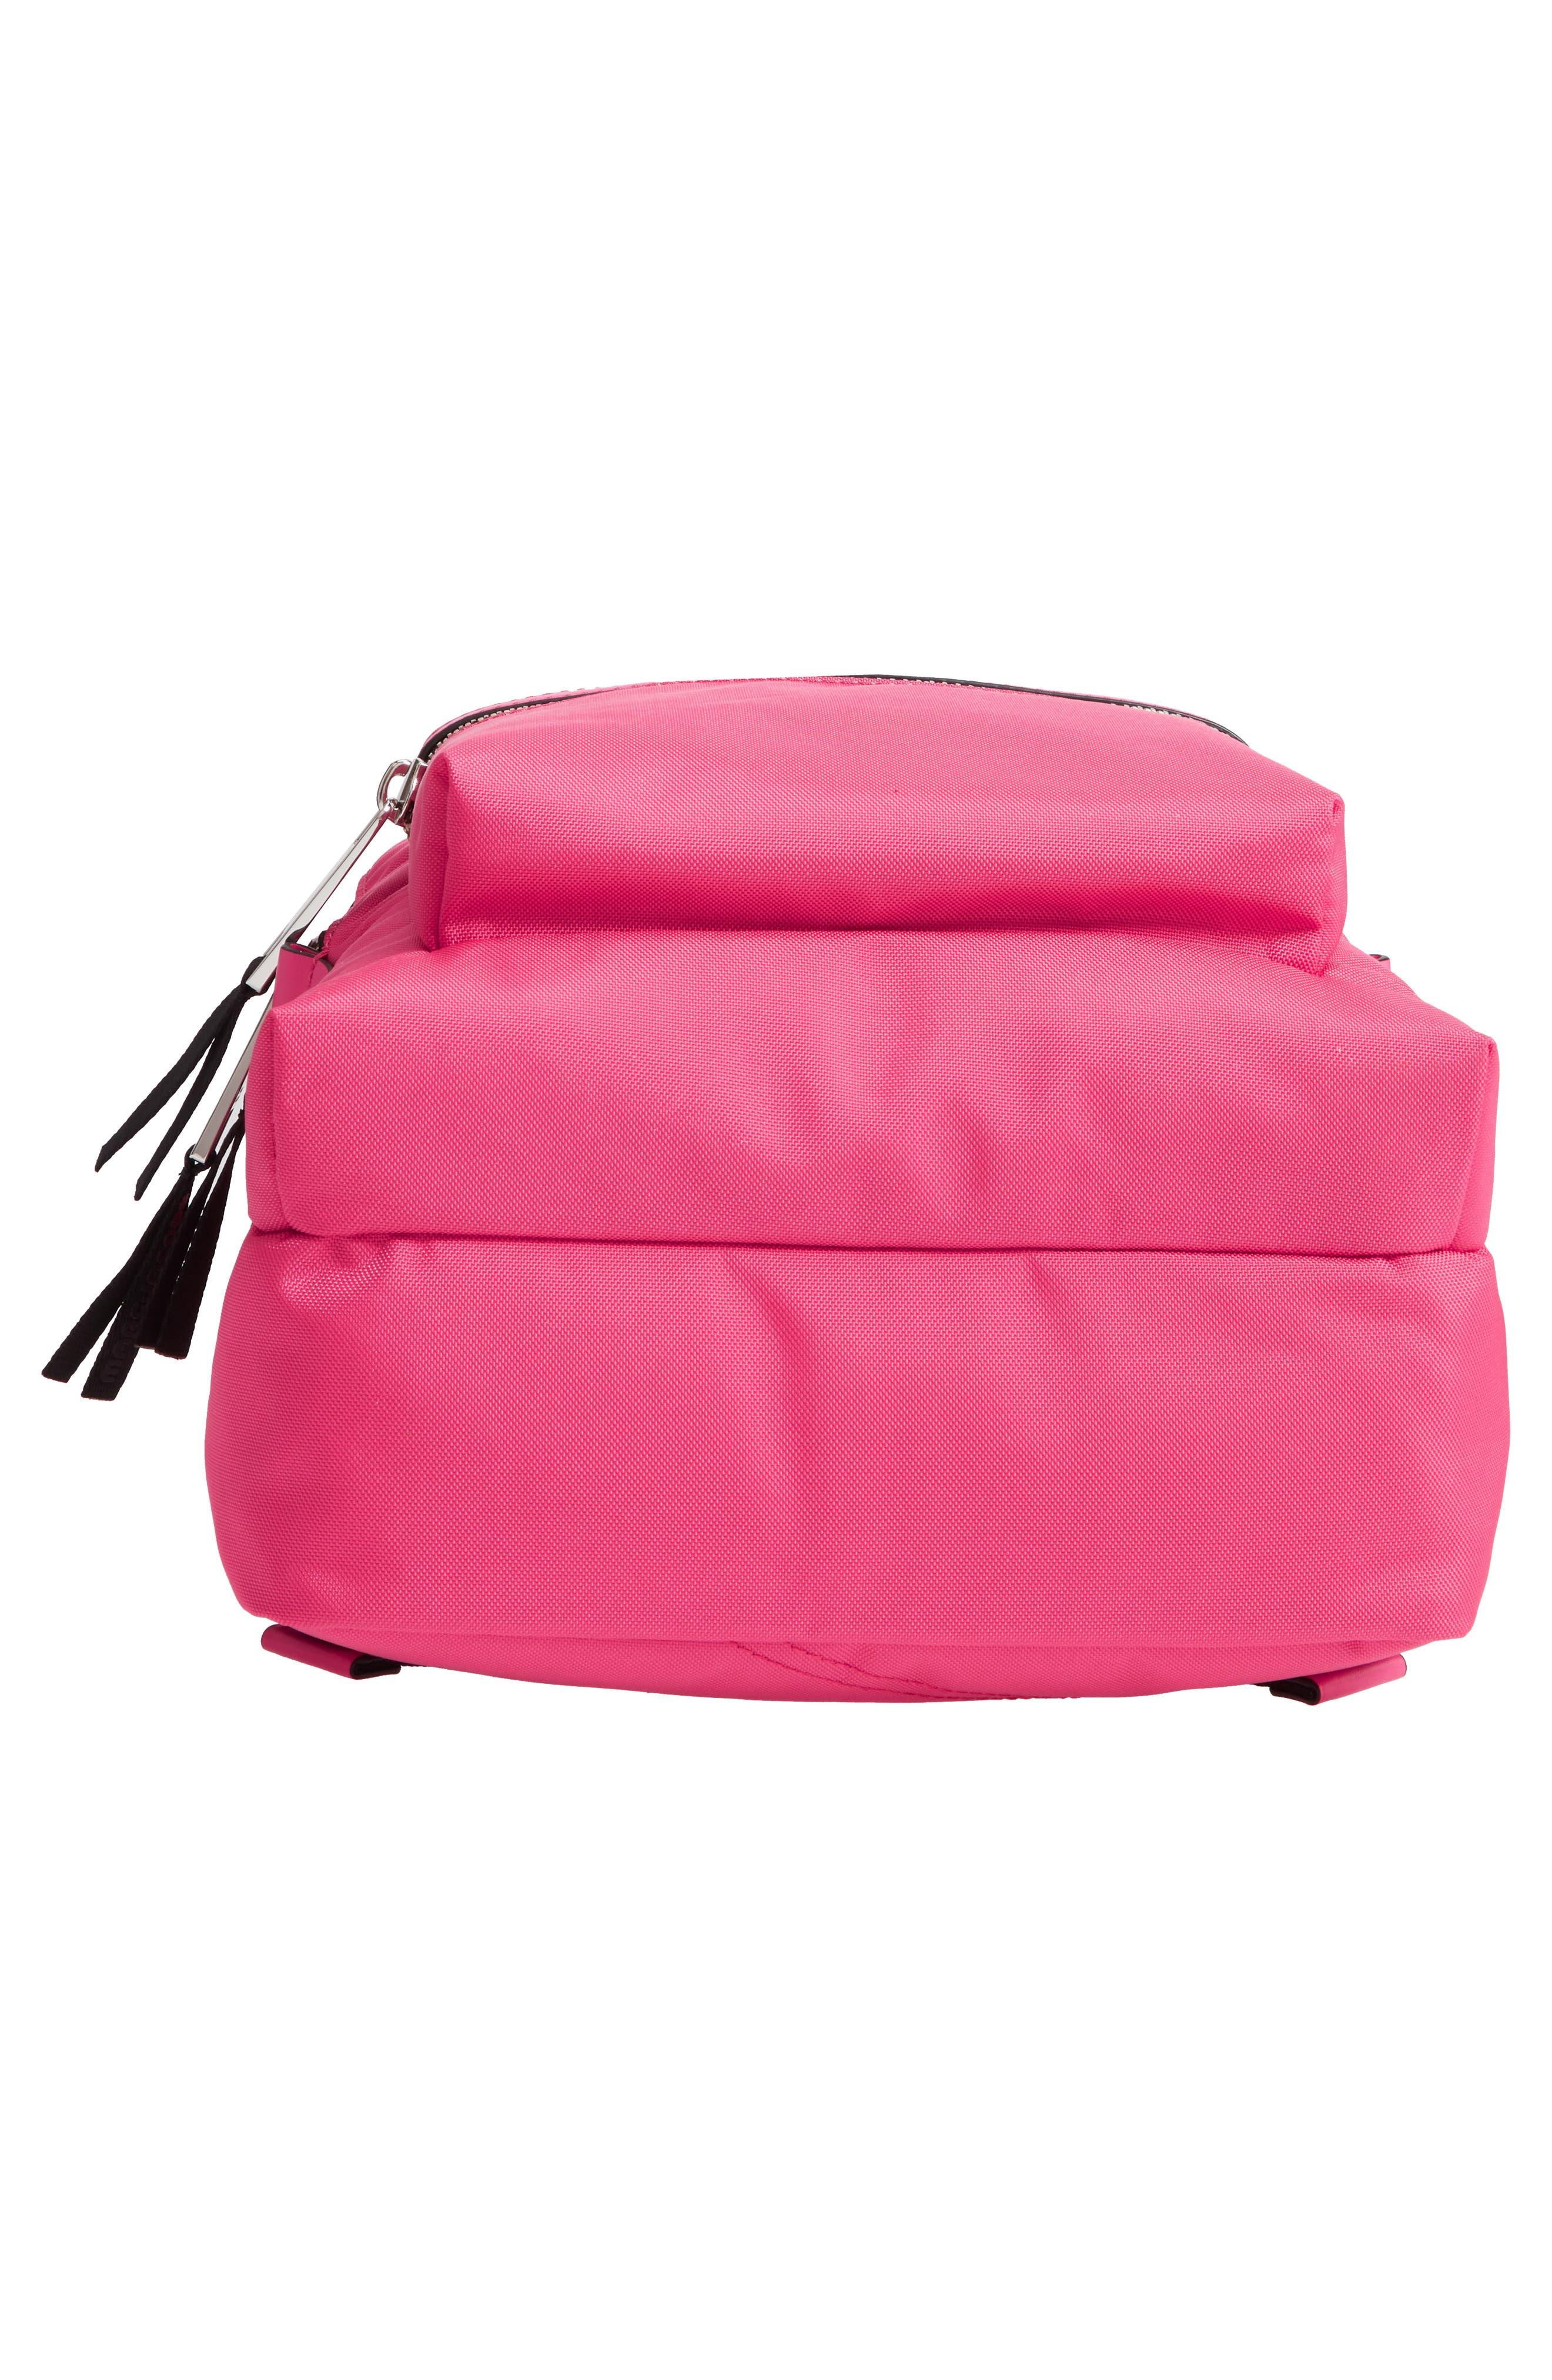 Medium Sport Trek Backpack,                             Alternate thumbnail 6, color,                             PEONY